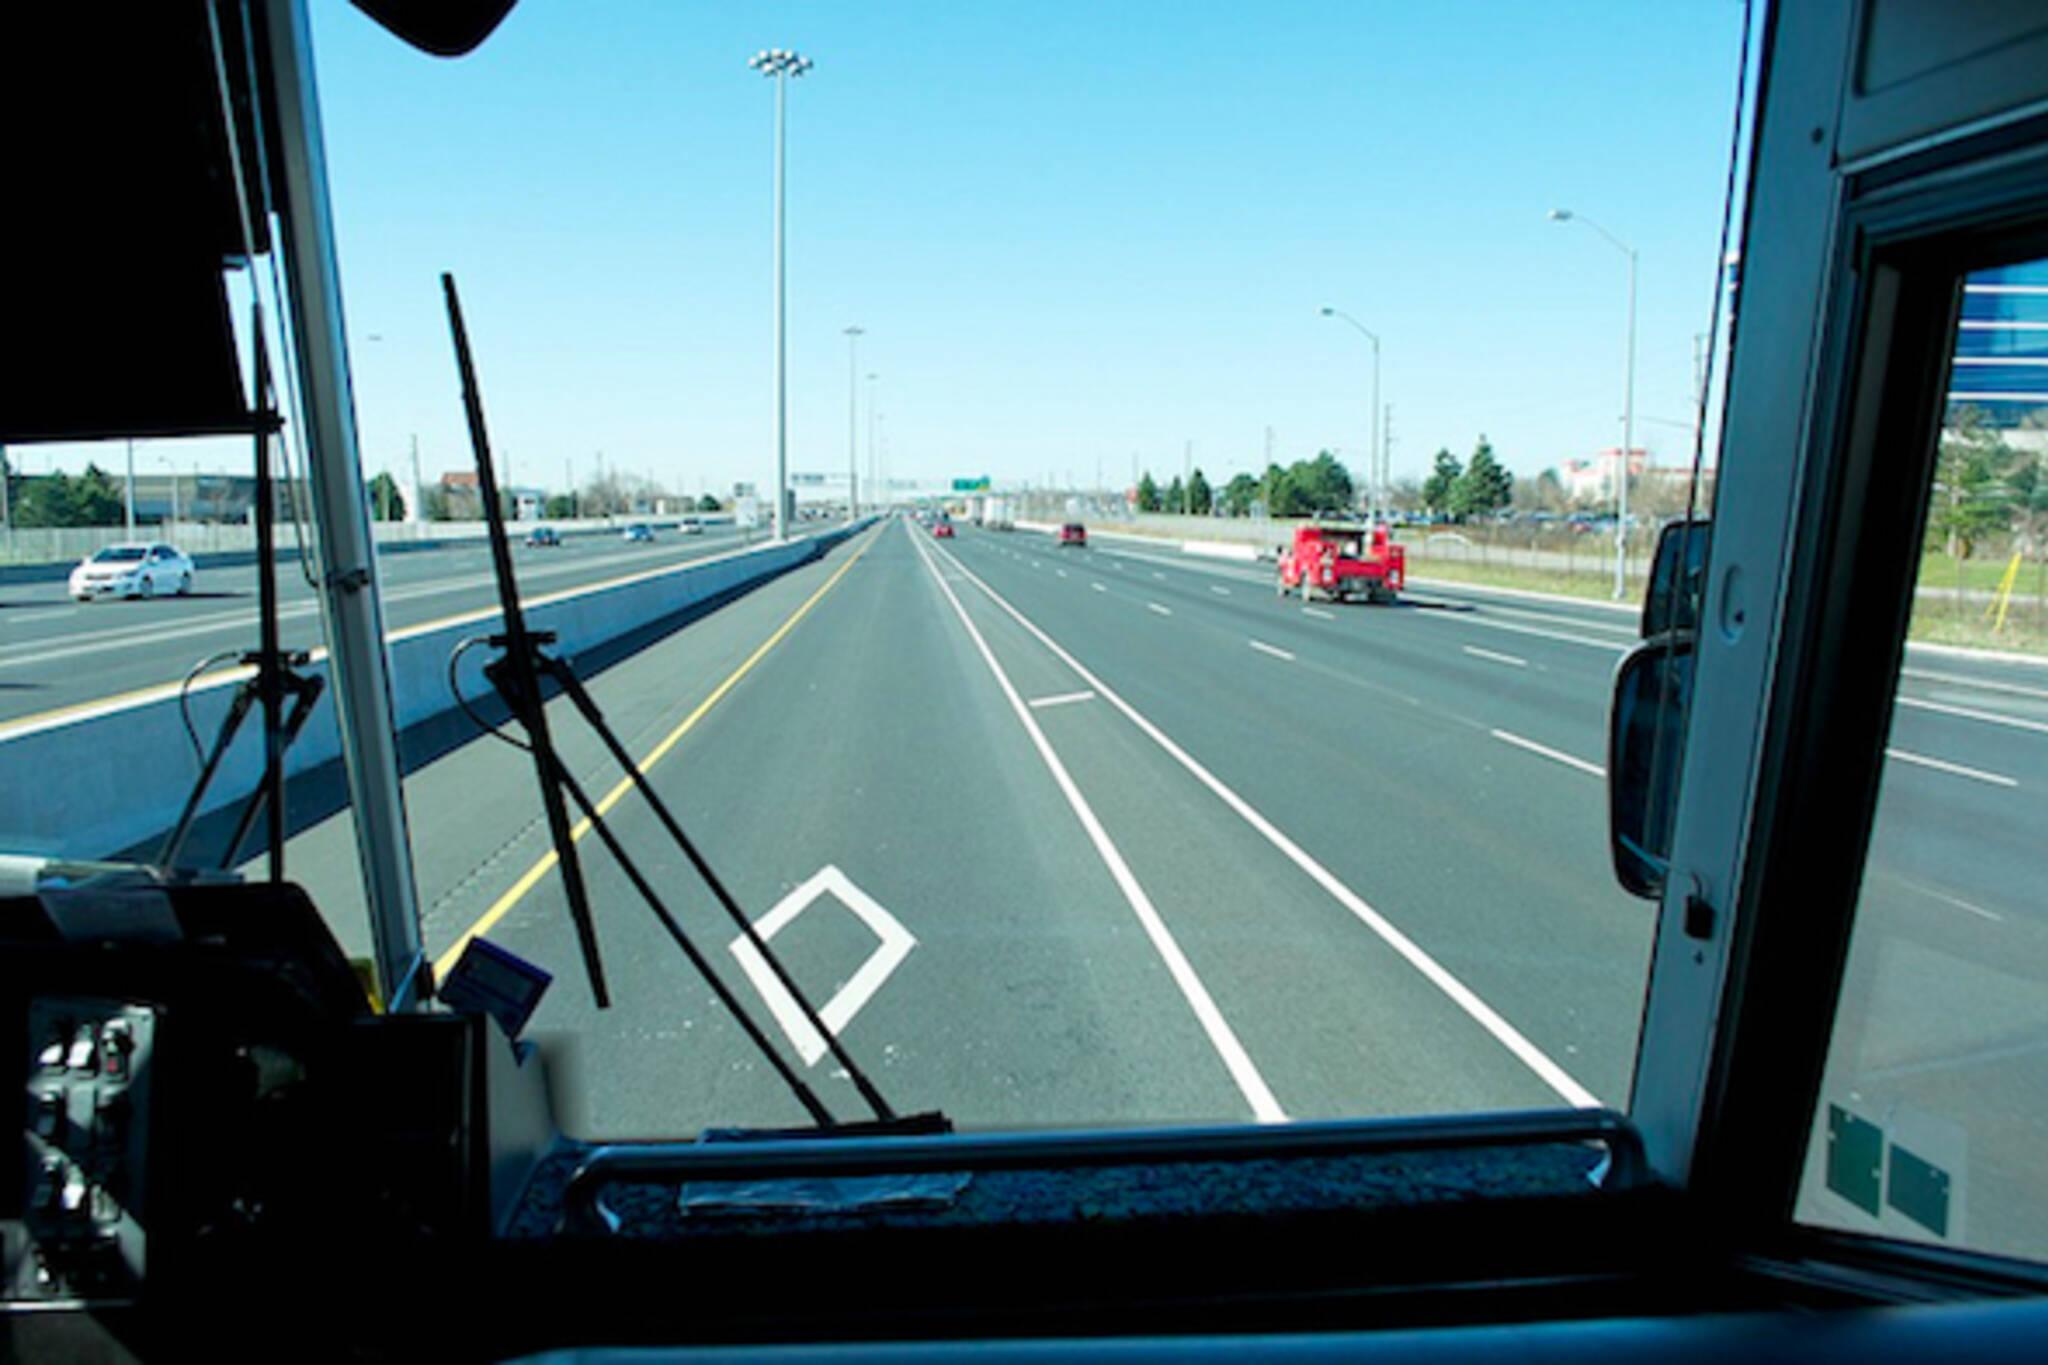 MB Bus Ride